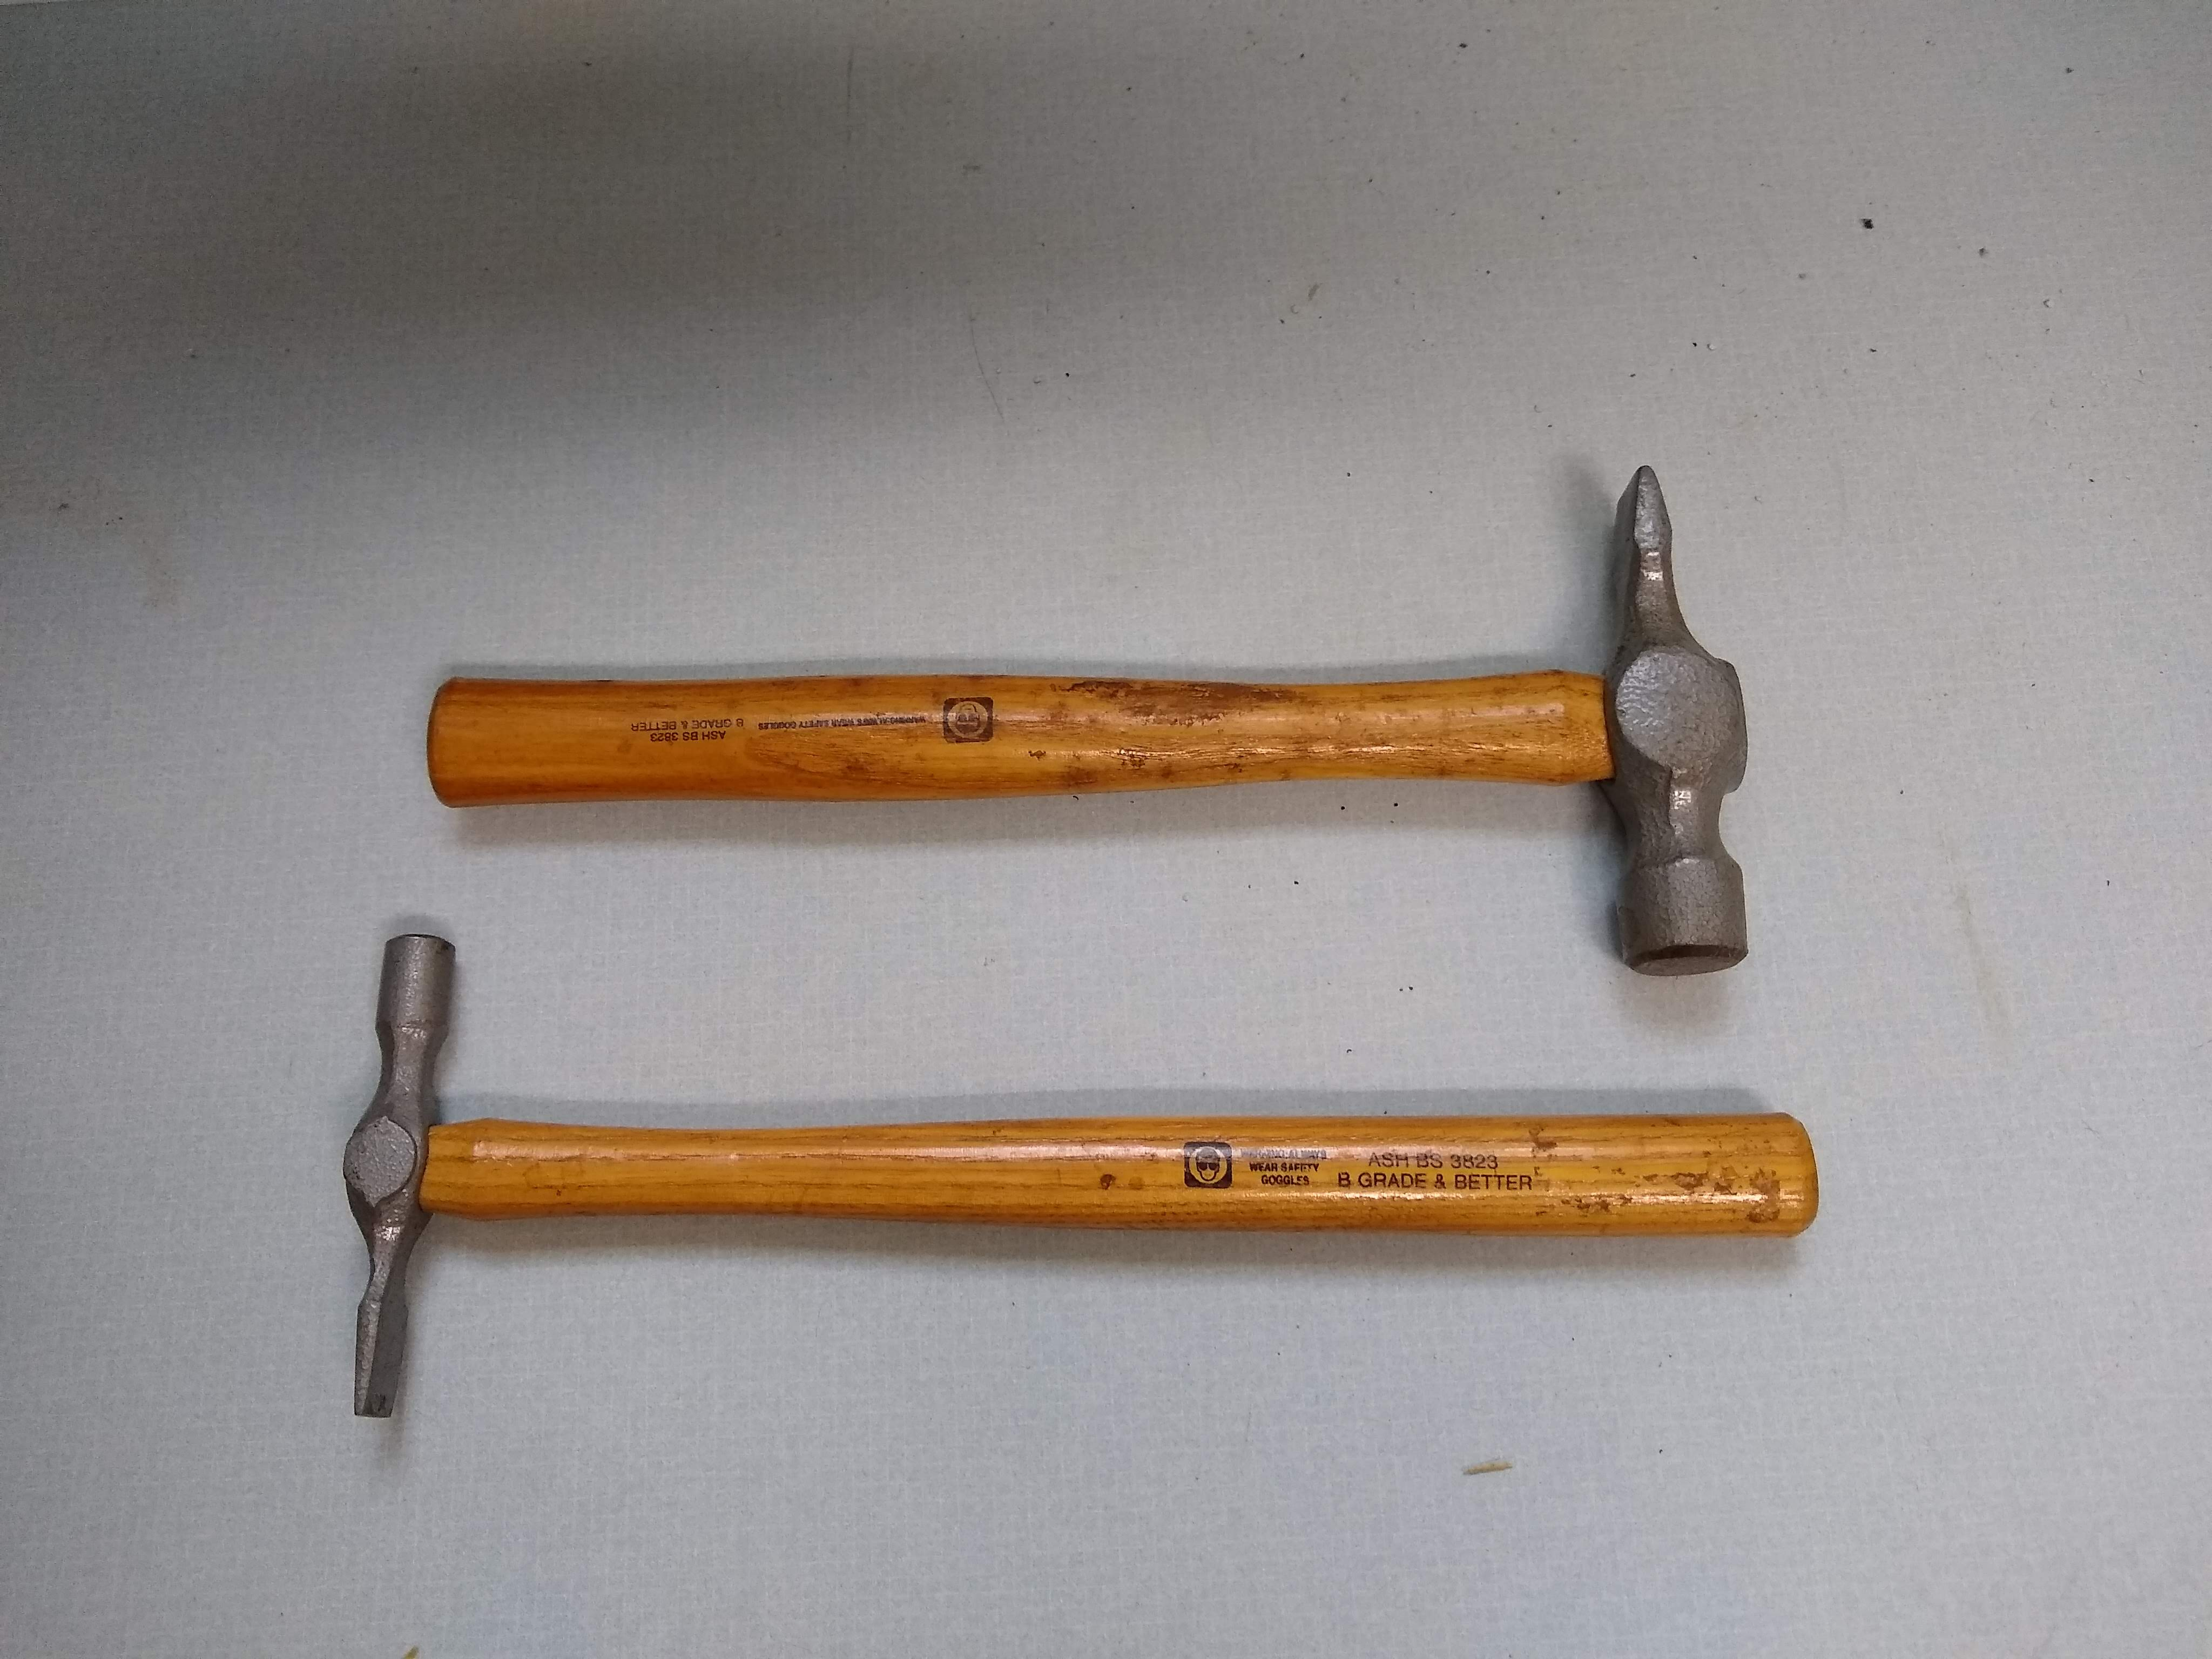 Warrington Hammer_5.22.21_01.jpg